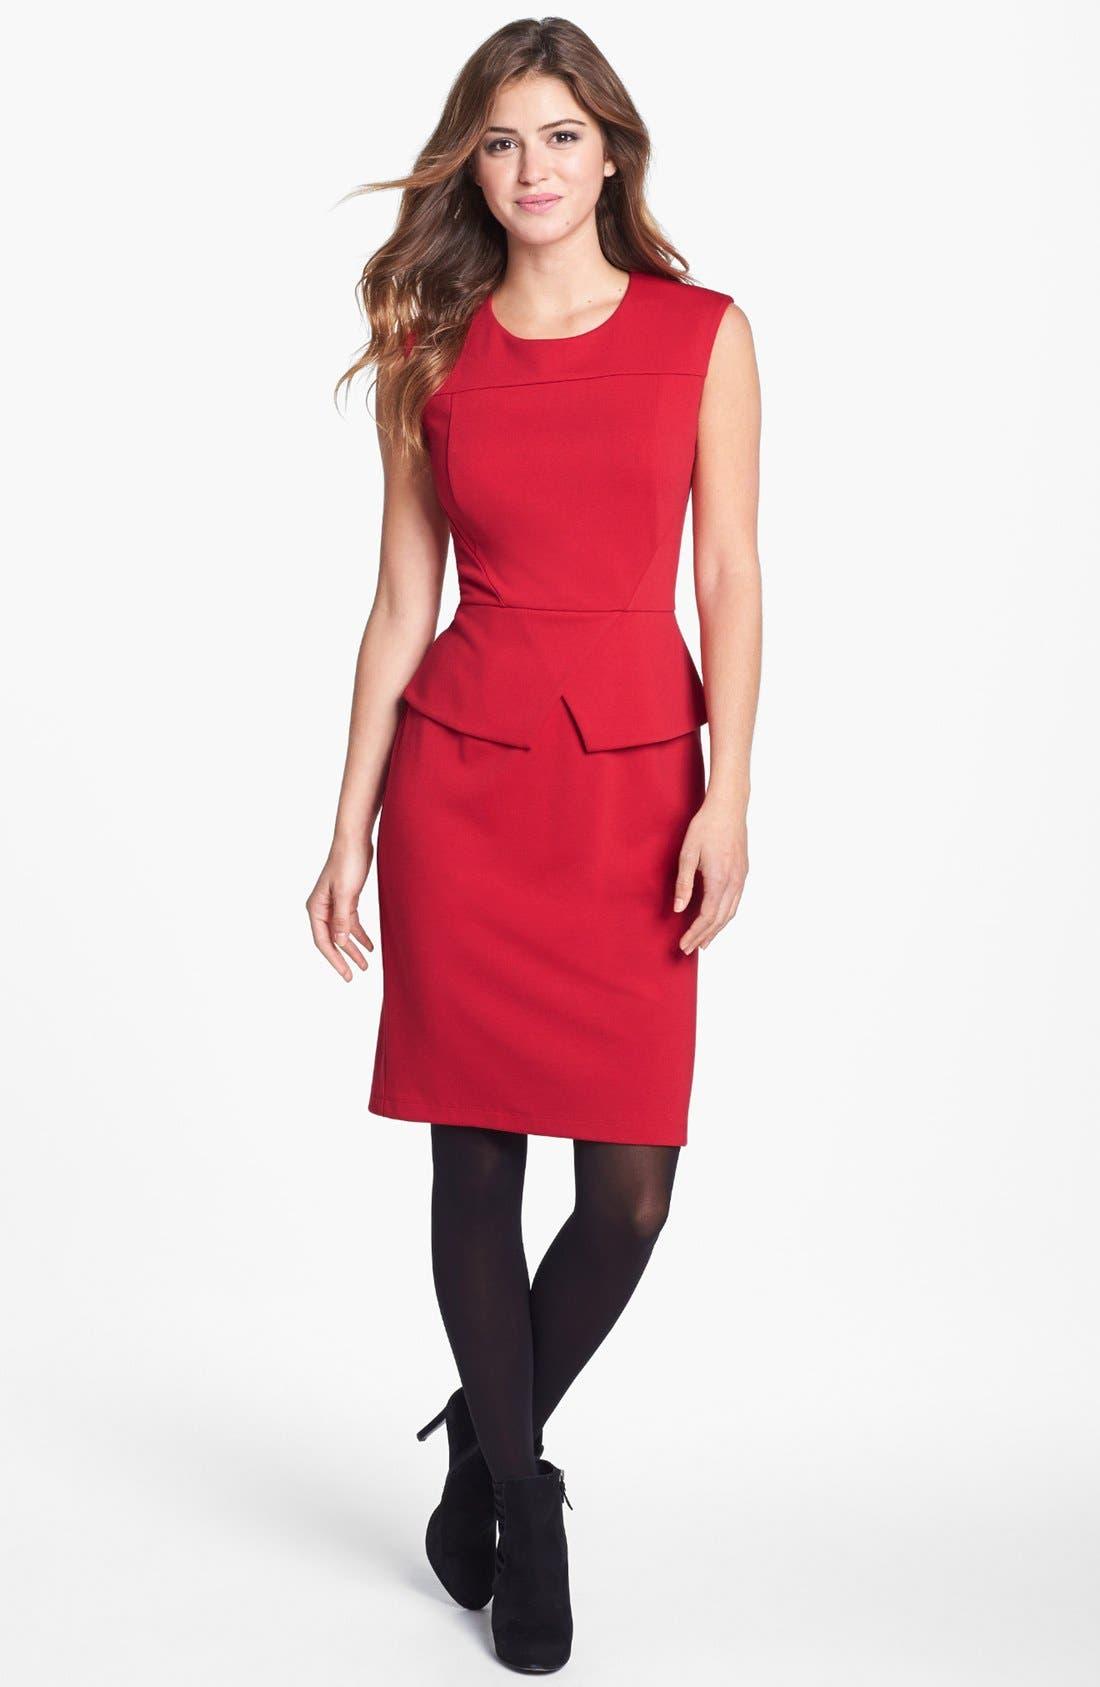 Alternate Image 1 Selected - Calvin Klein Cap Sleeve Peplum Sheath Dress (Online Only)